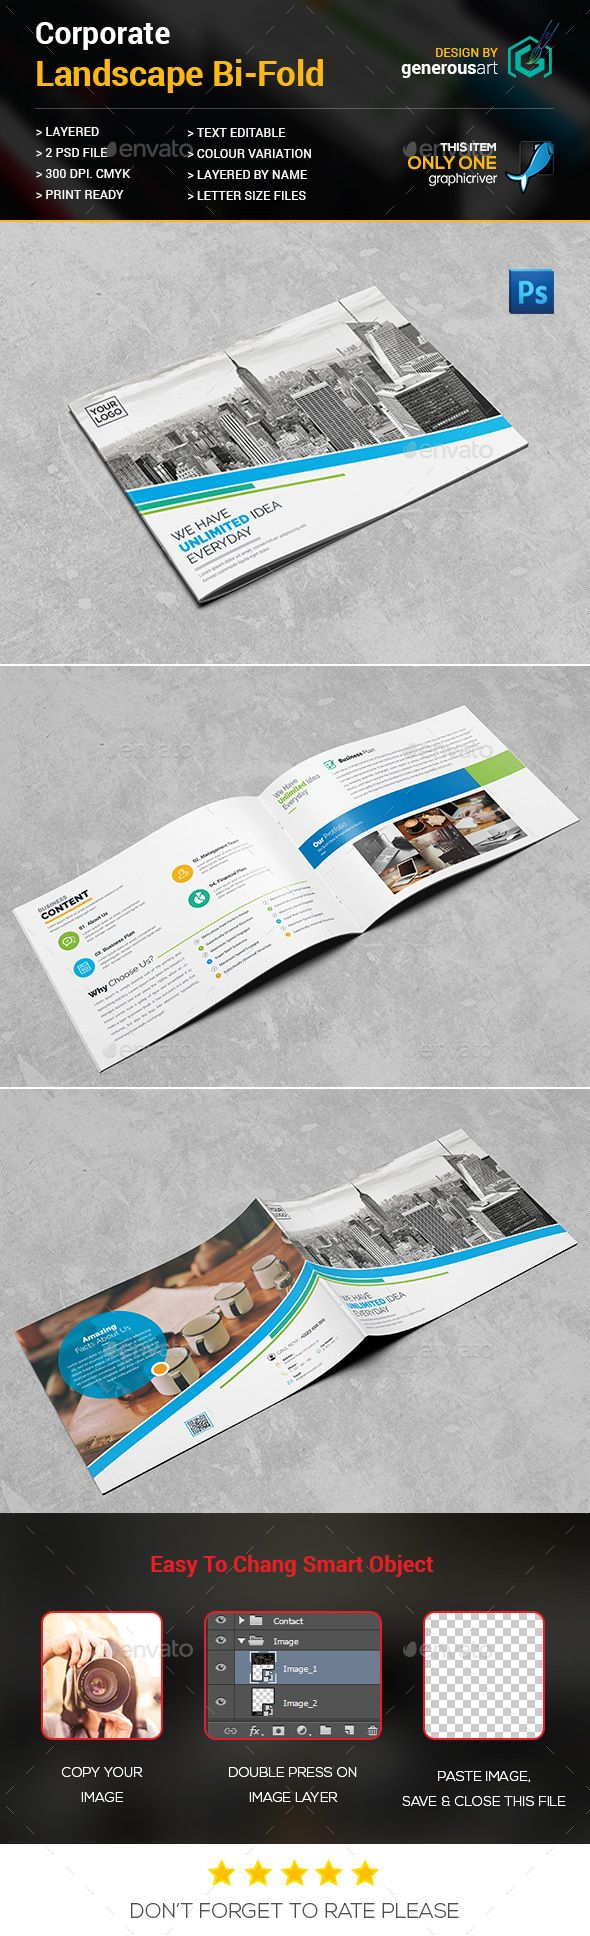 Landscape Bi-Fold Template - Brochure Template PSD. Download here ...